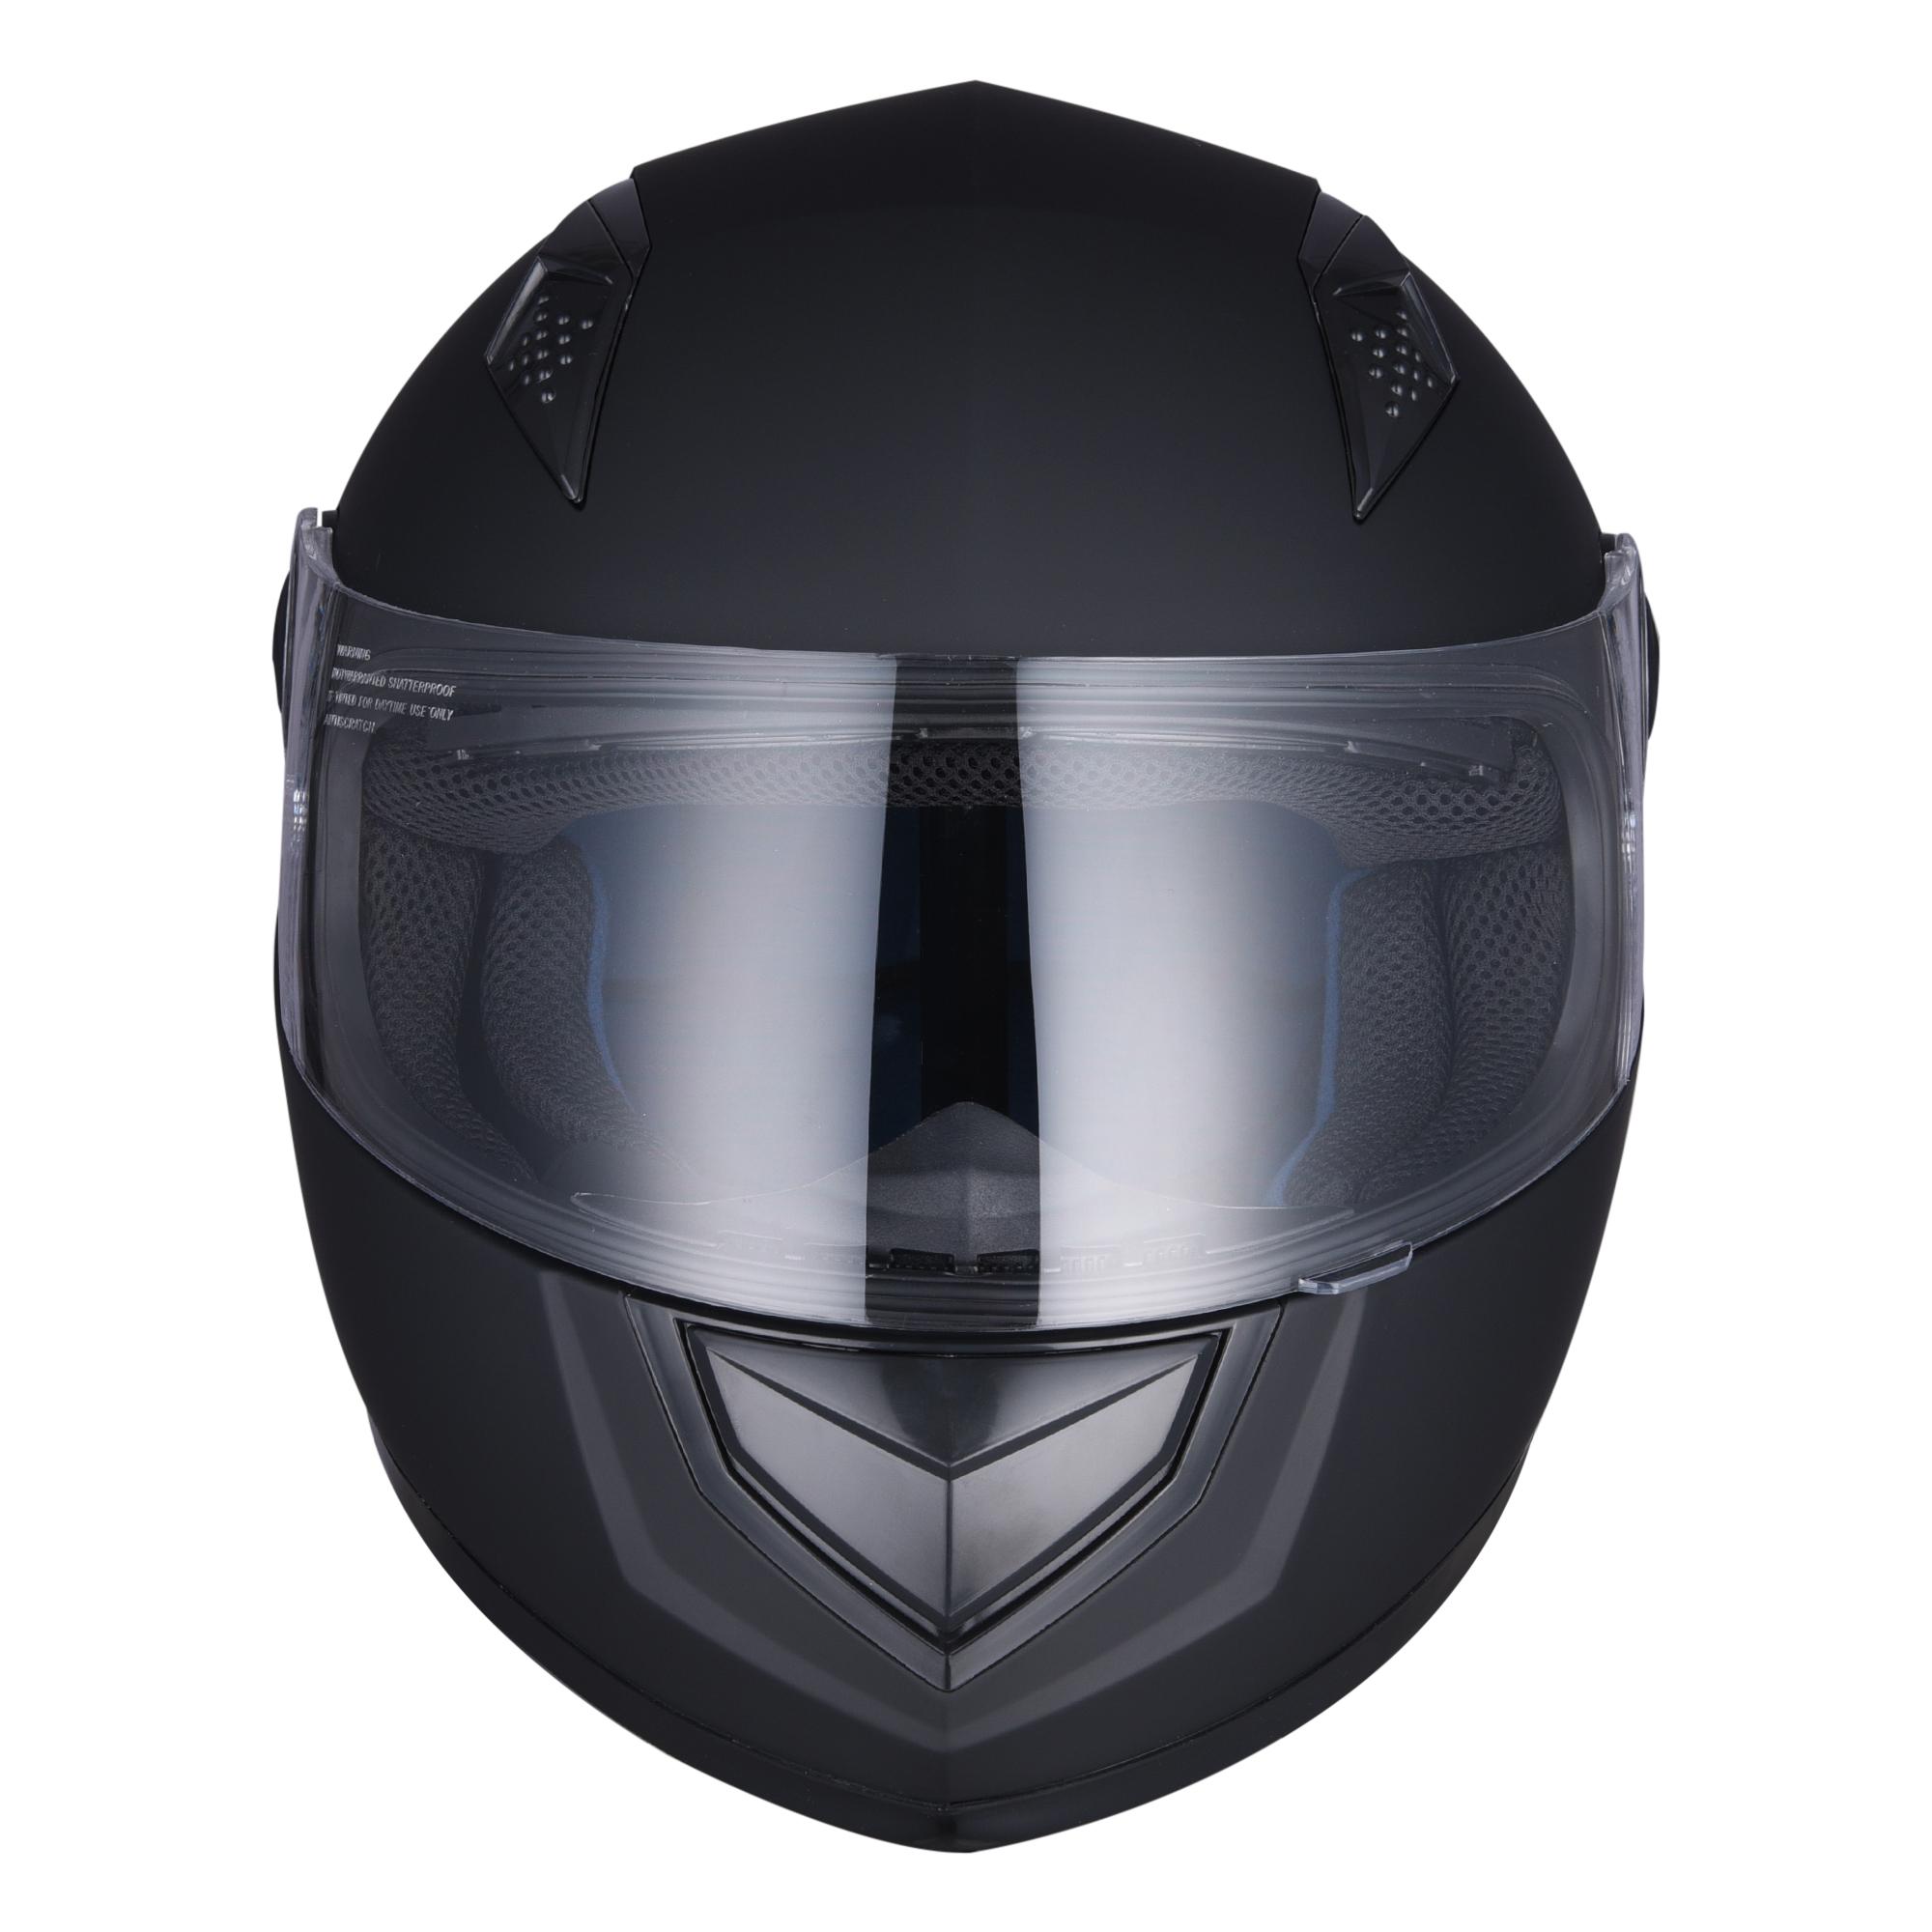 miniature 61 - AHR K12 Full Face Motorcycle Helmet DOT Air Vents Clear Visor Racing S M L XL